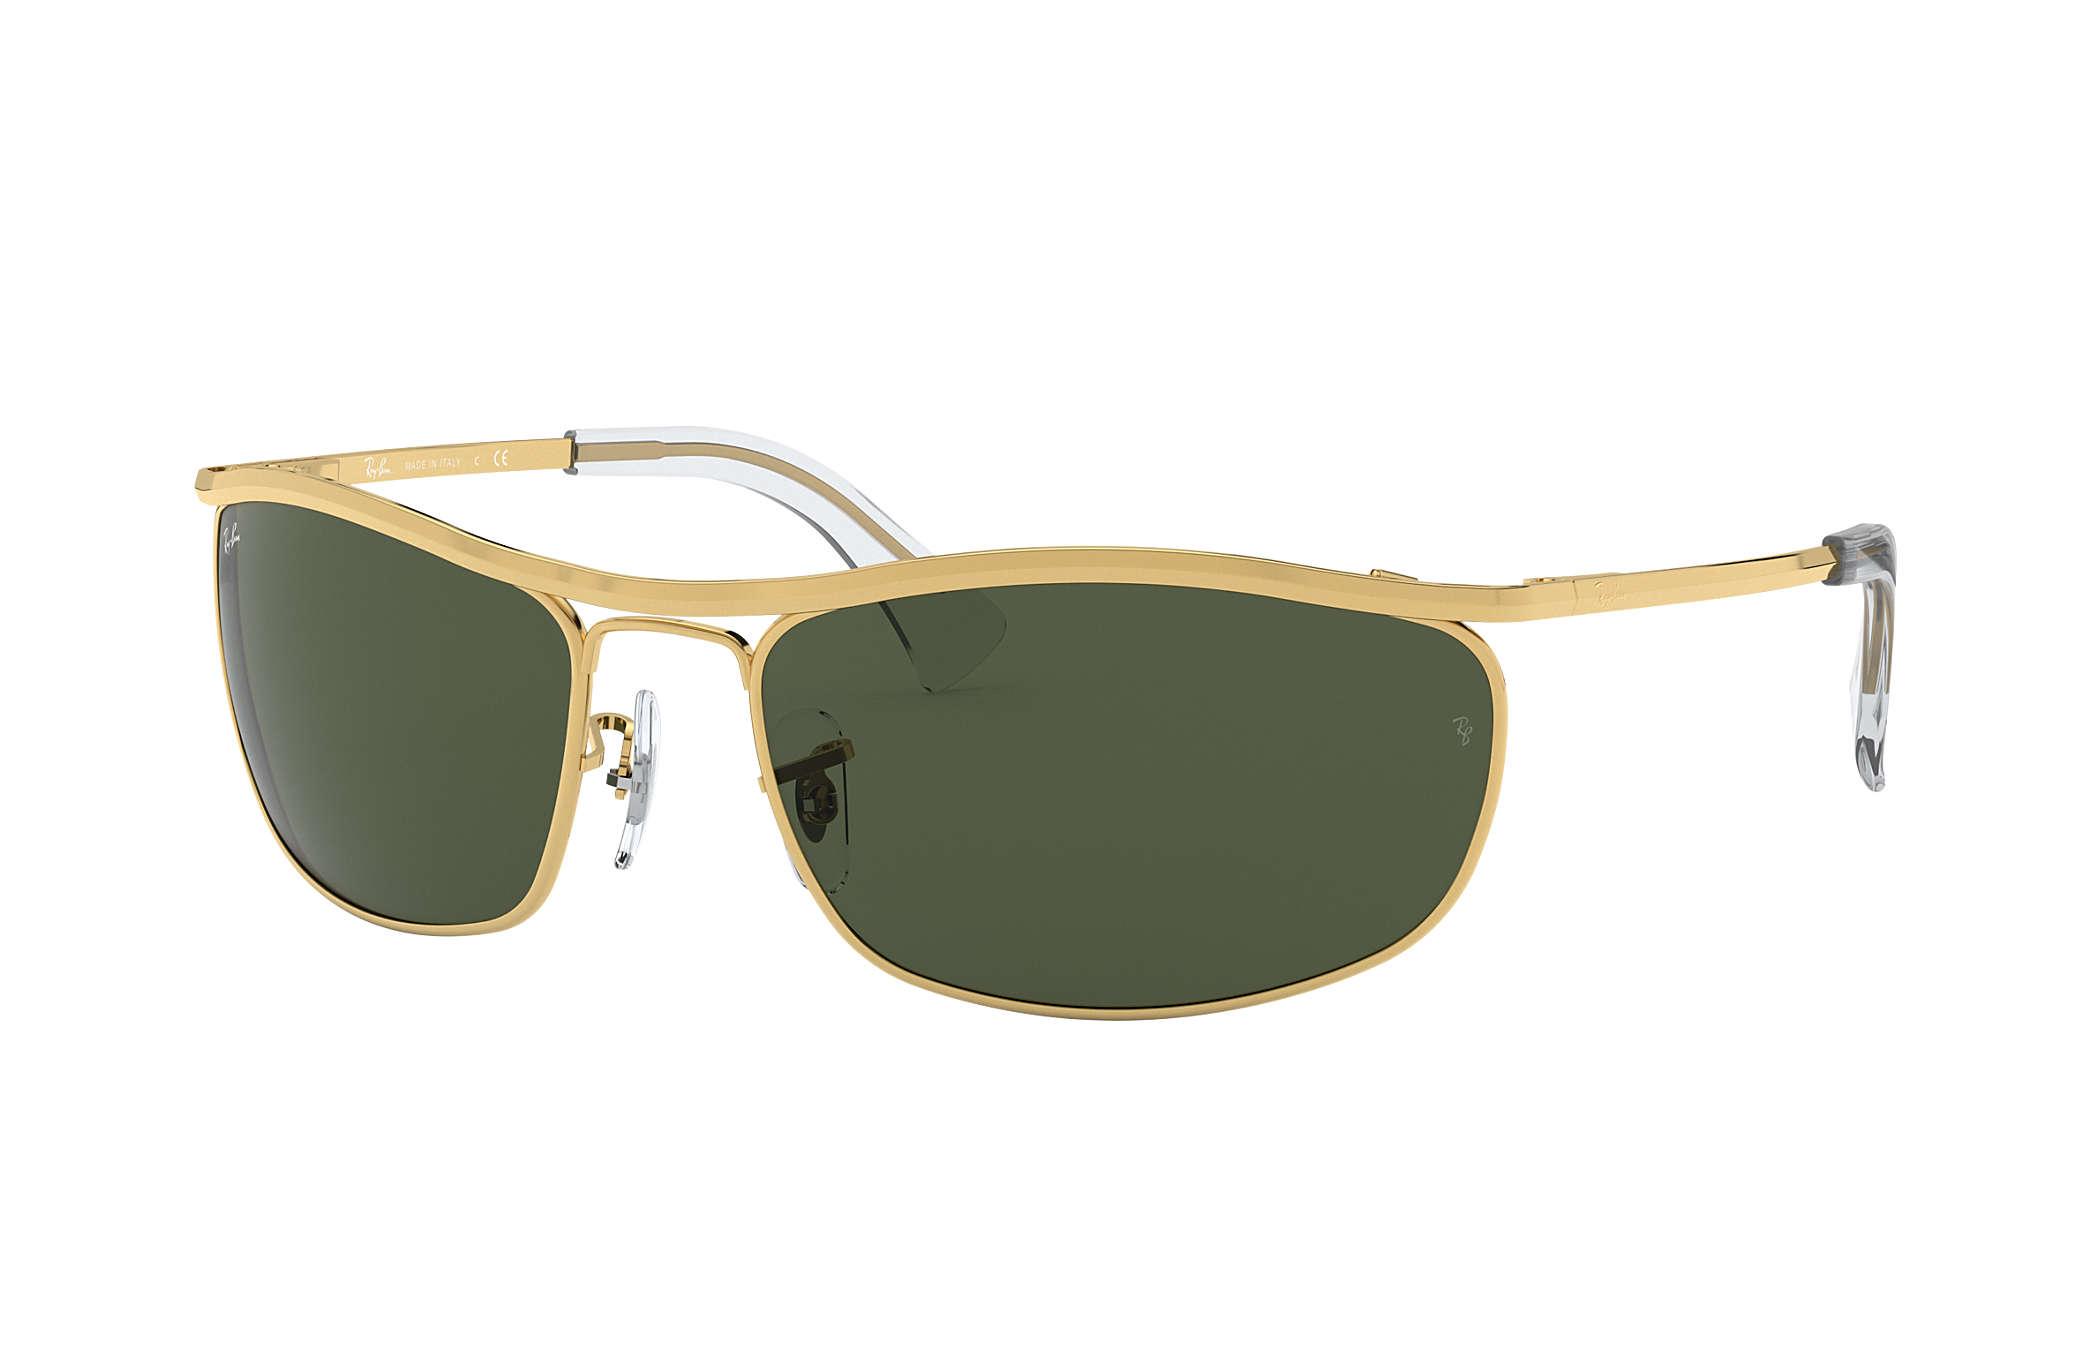 b8297760823 Ray-Ban Caravan RB3136 Gold - Metal - Green Lenses - 0RB313600155 ...